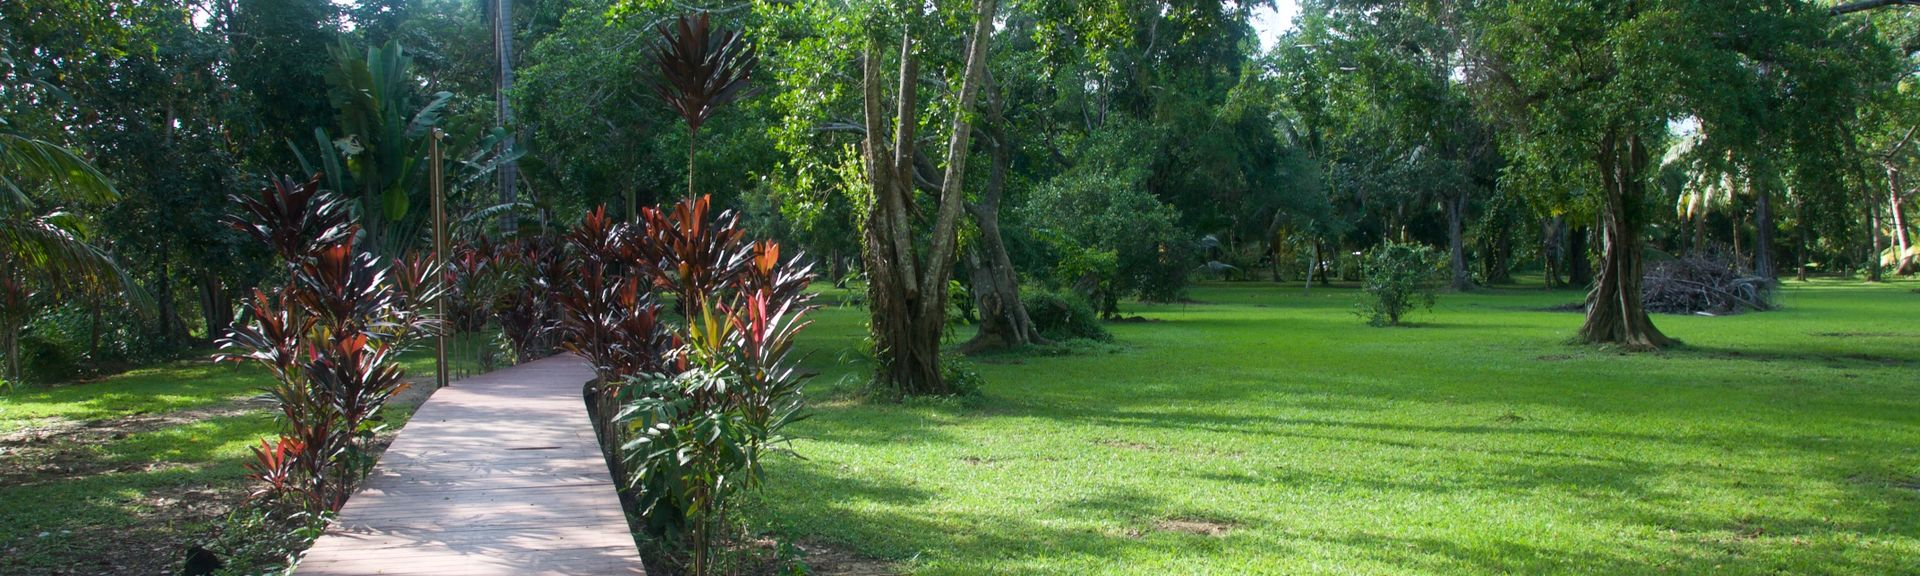 District de Stann Creek, Belize